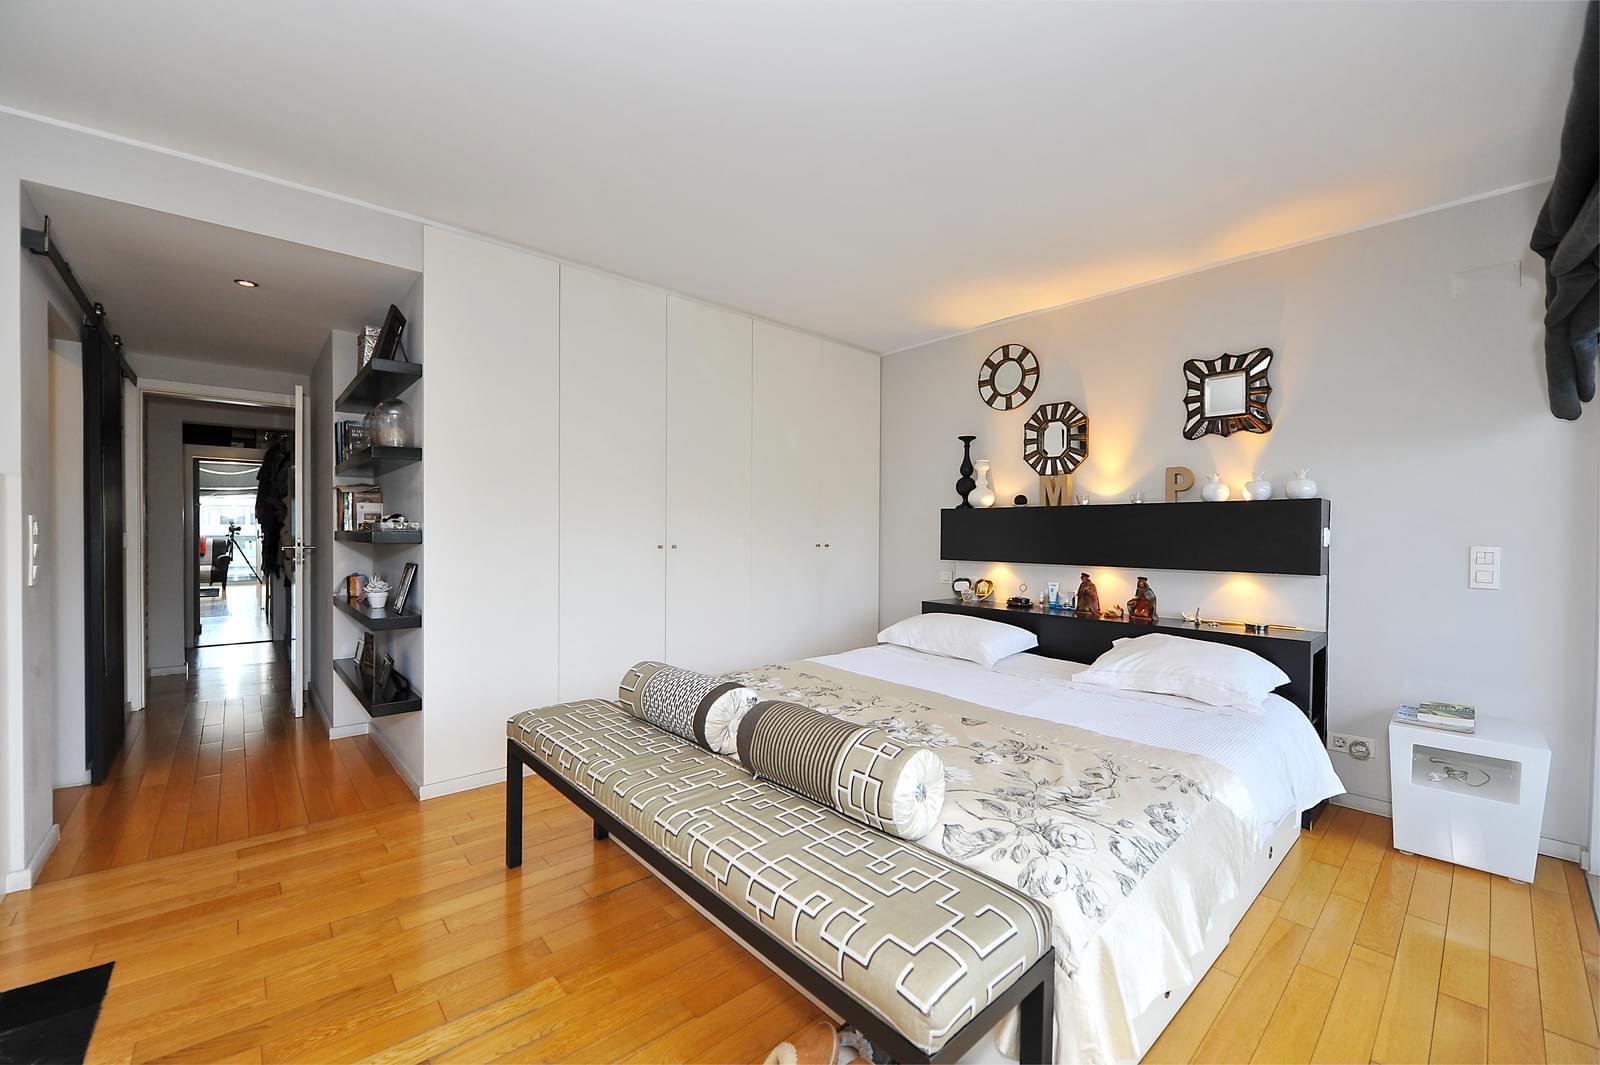 pf18728-apartamento-t5-oeiras-d0b94bca-3c09-4ad0-aa58-72e366bfaa95